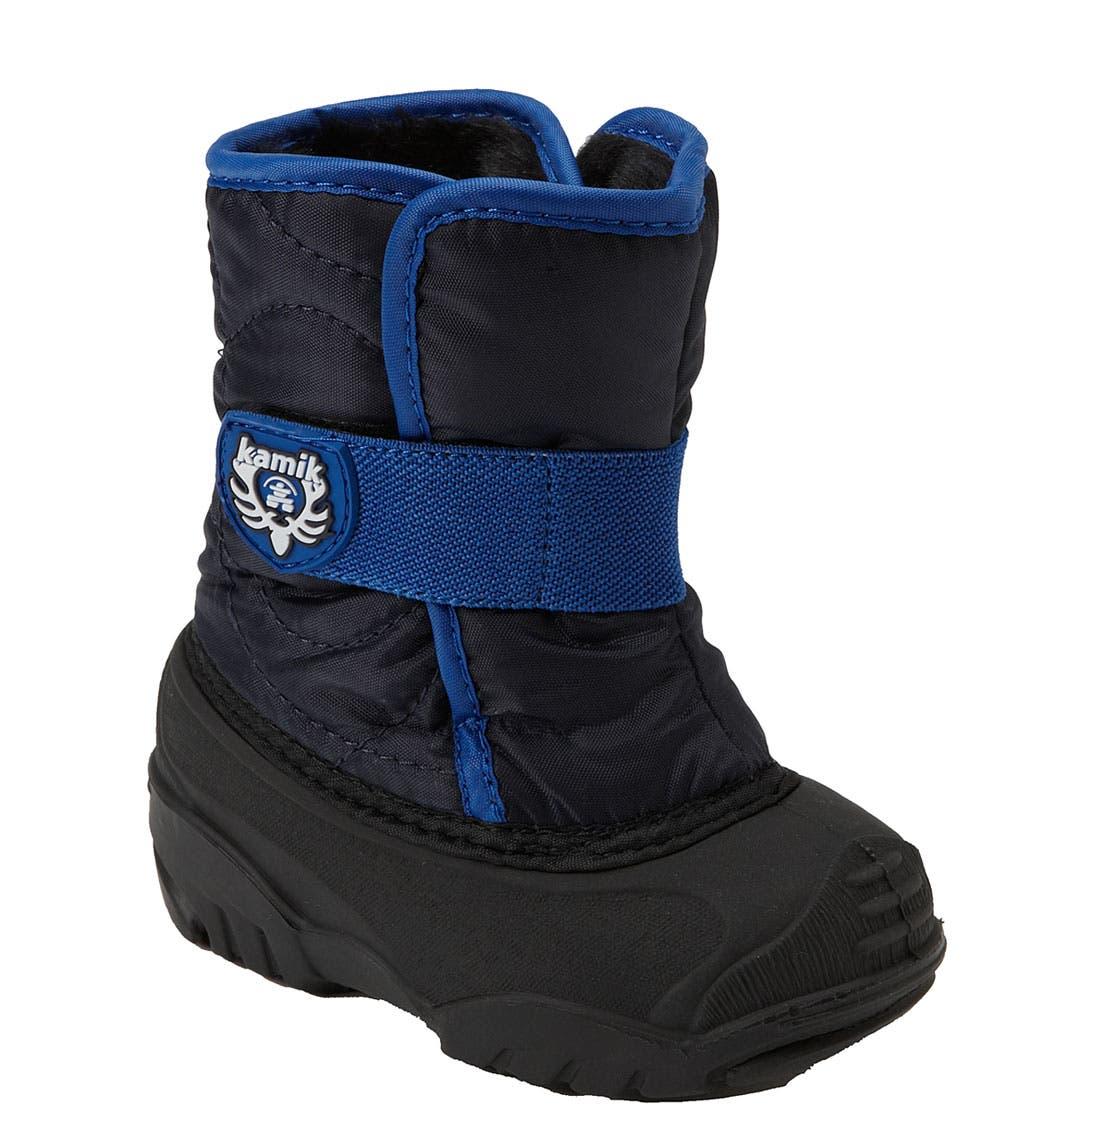 Main Image - Kamik 'Snowbug' Waterproof Boot (Walker & Toddler)